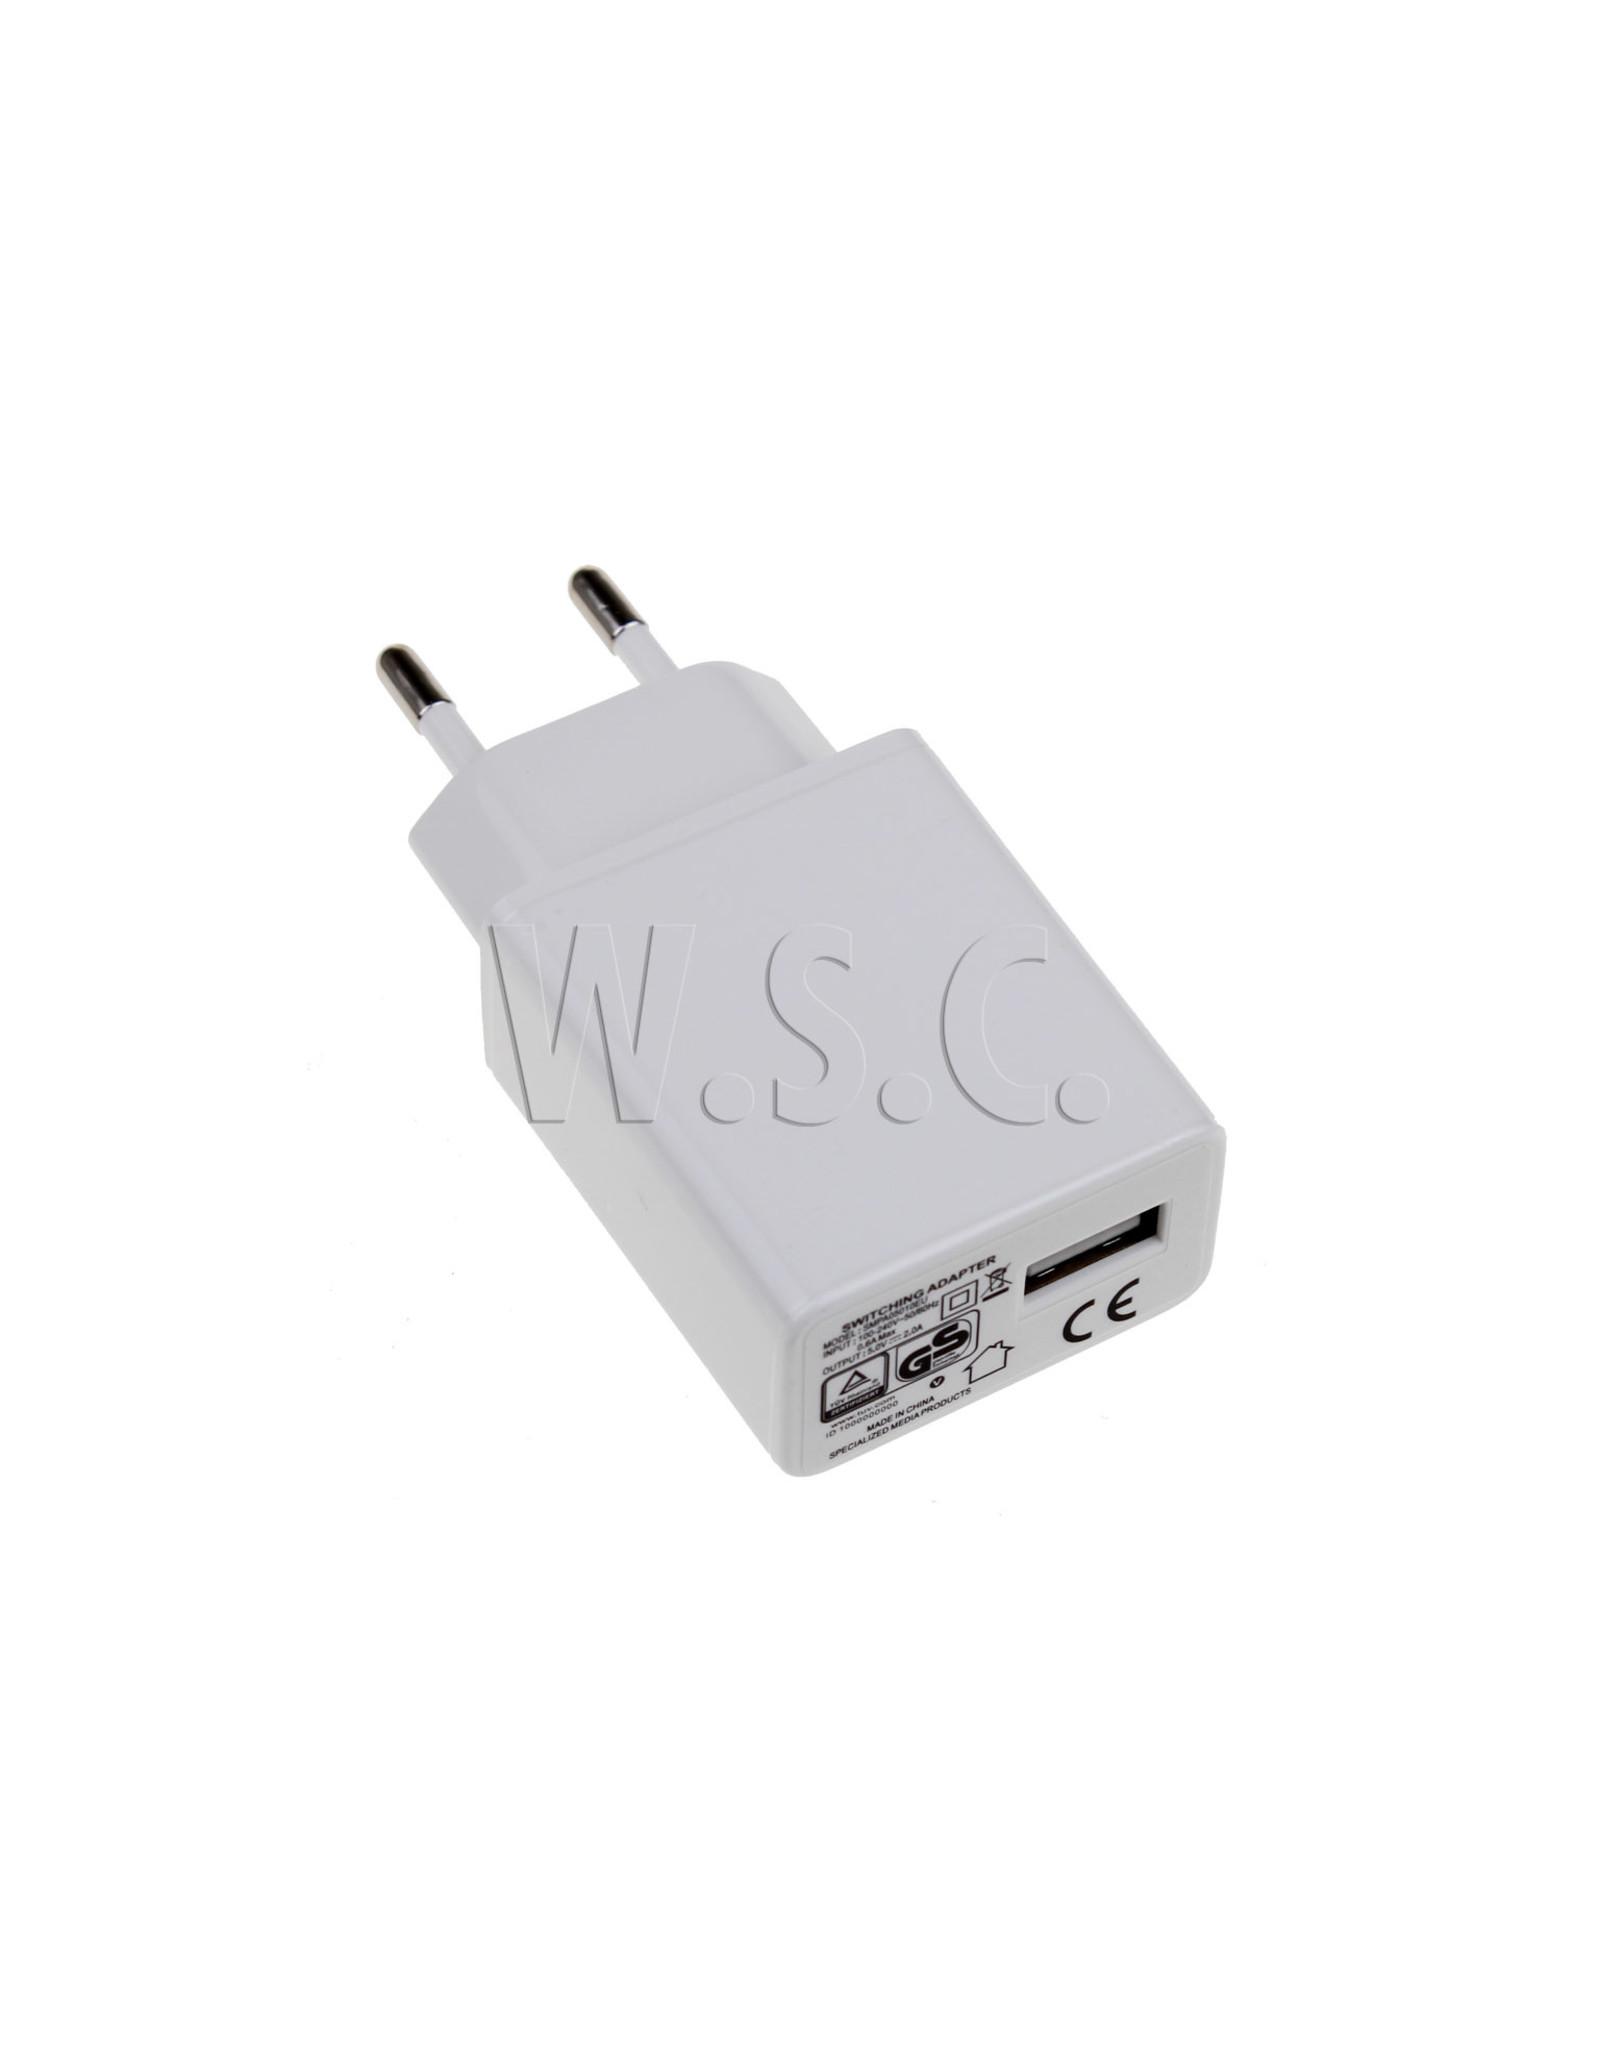 Spez NETADAPTER USB - SMARTPHONE / TABLET - 5V/2A